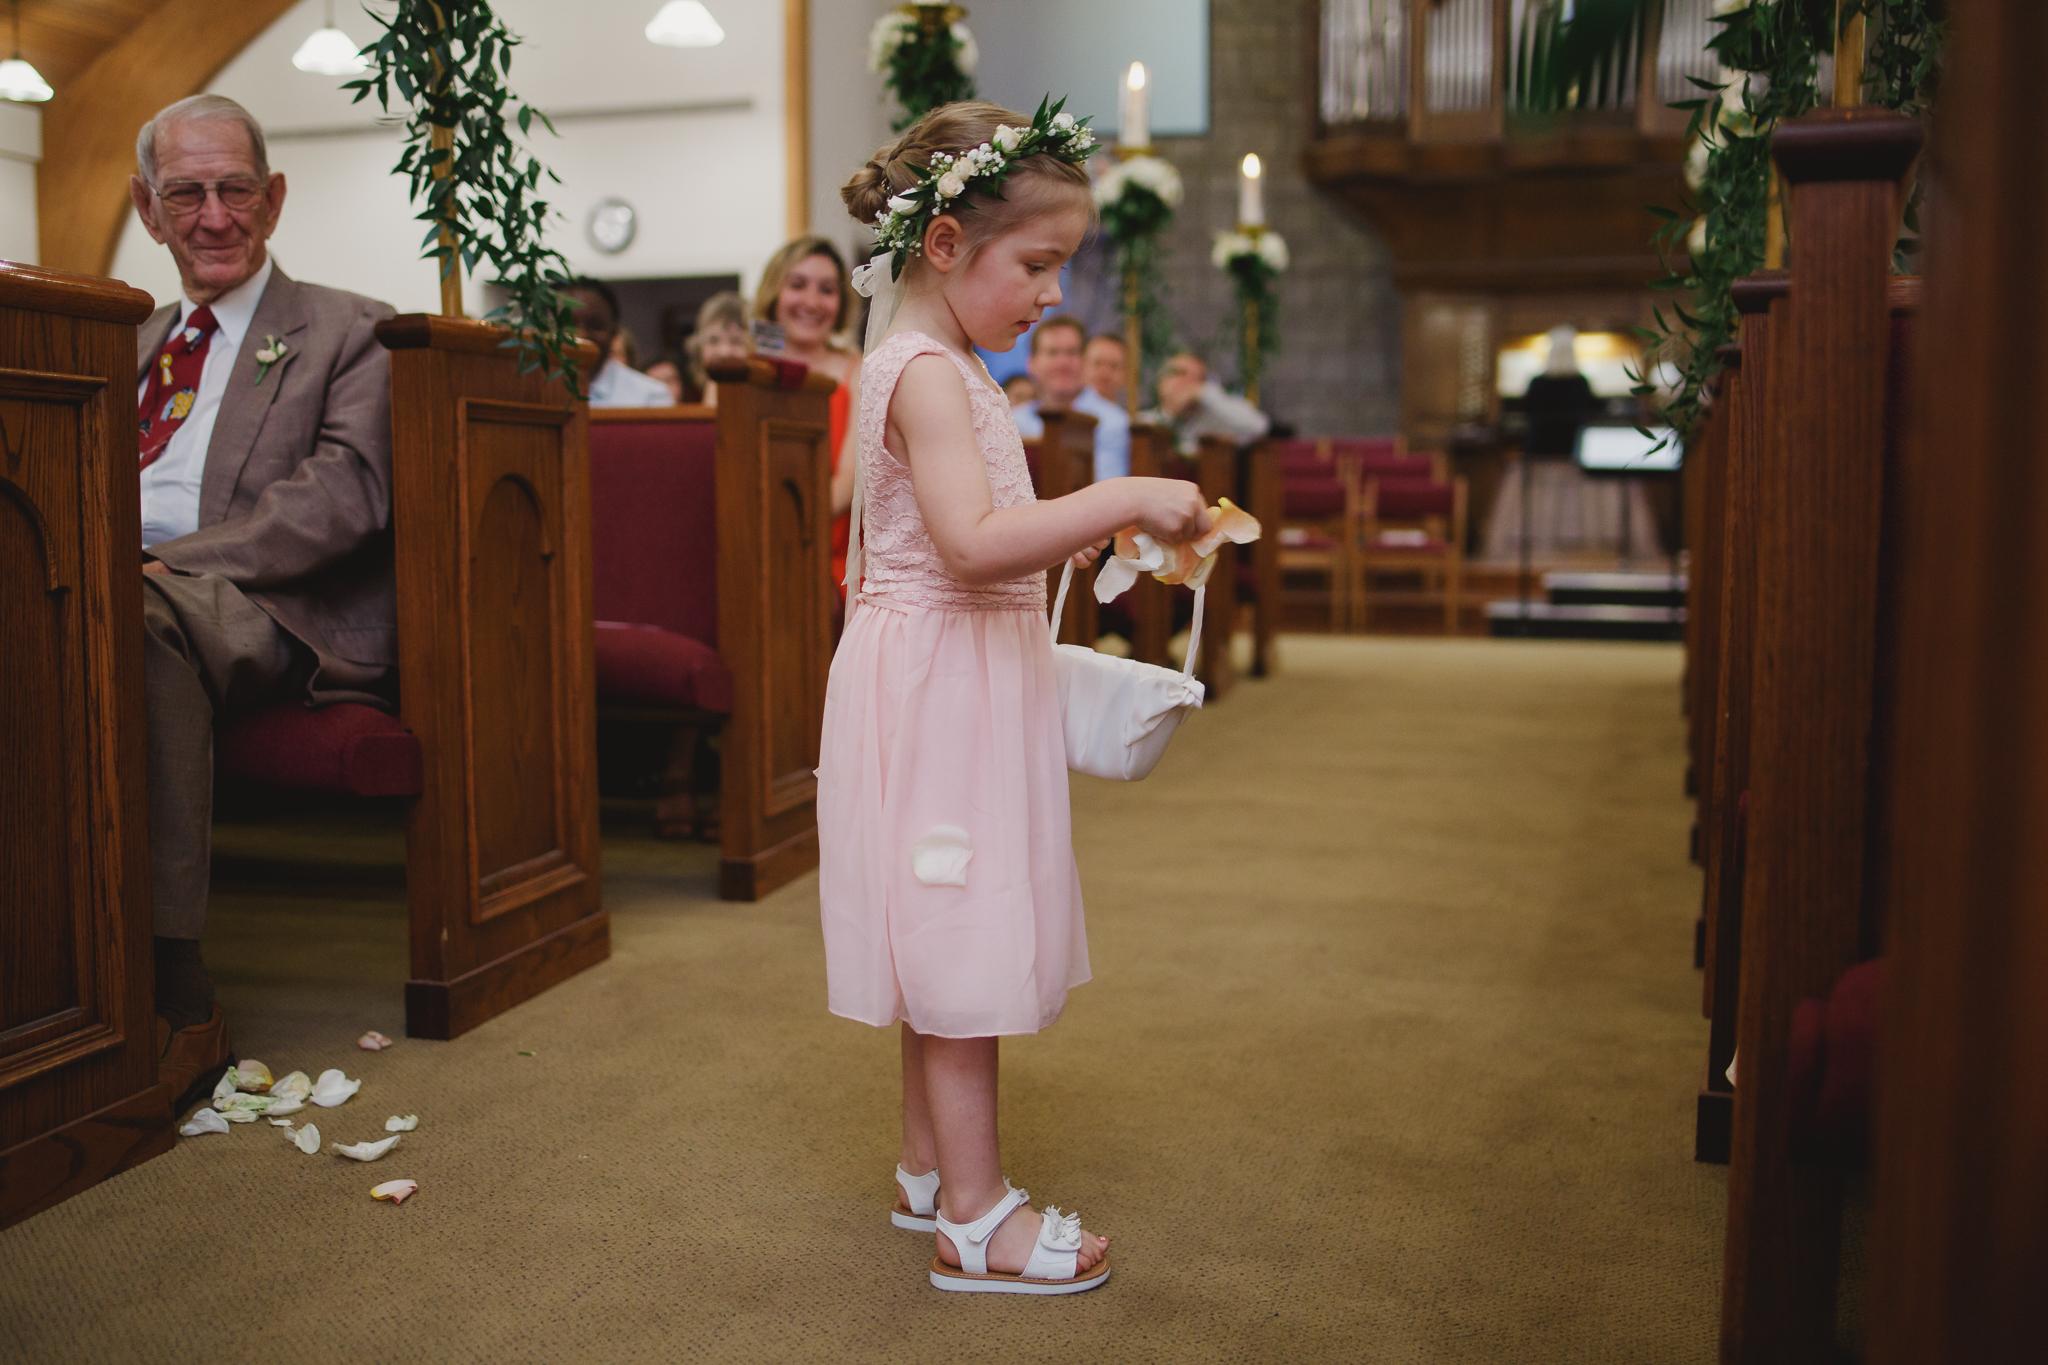 Michael and Kelly - the ashton depot - wedding DFW - wedding photographer- elizalde photography (24 of 150).jpg